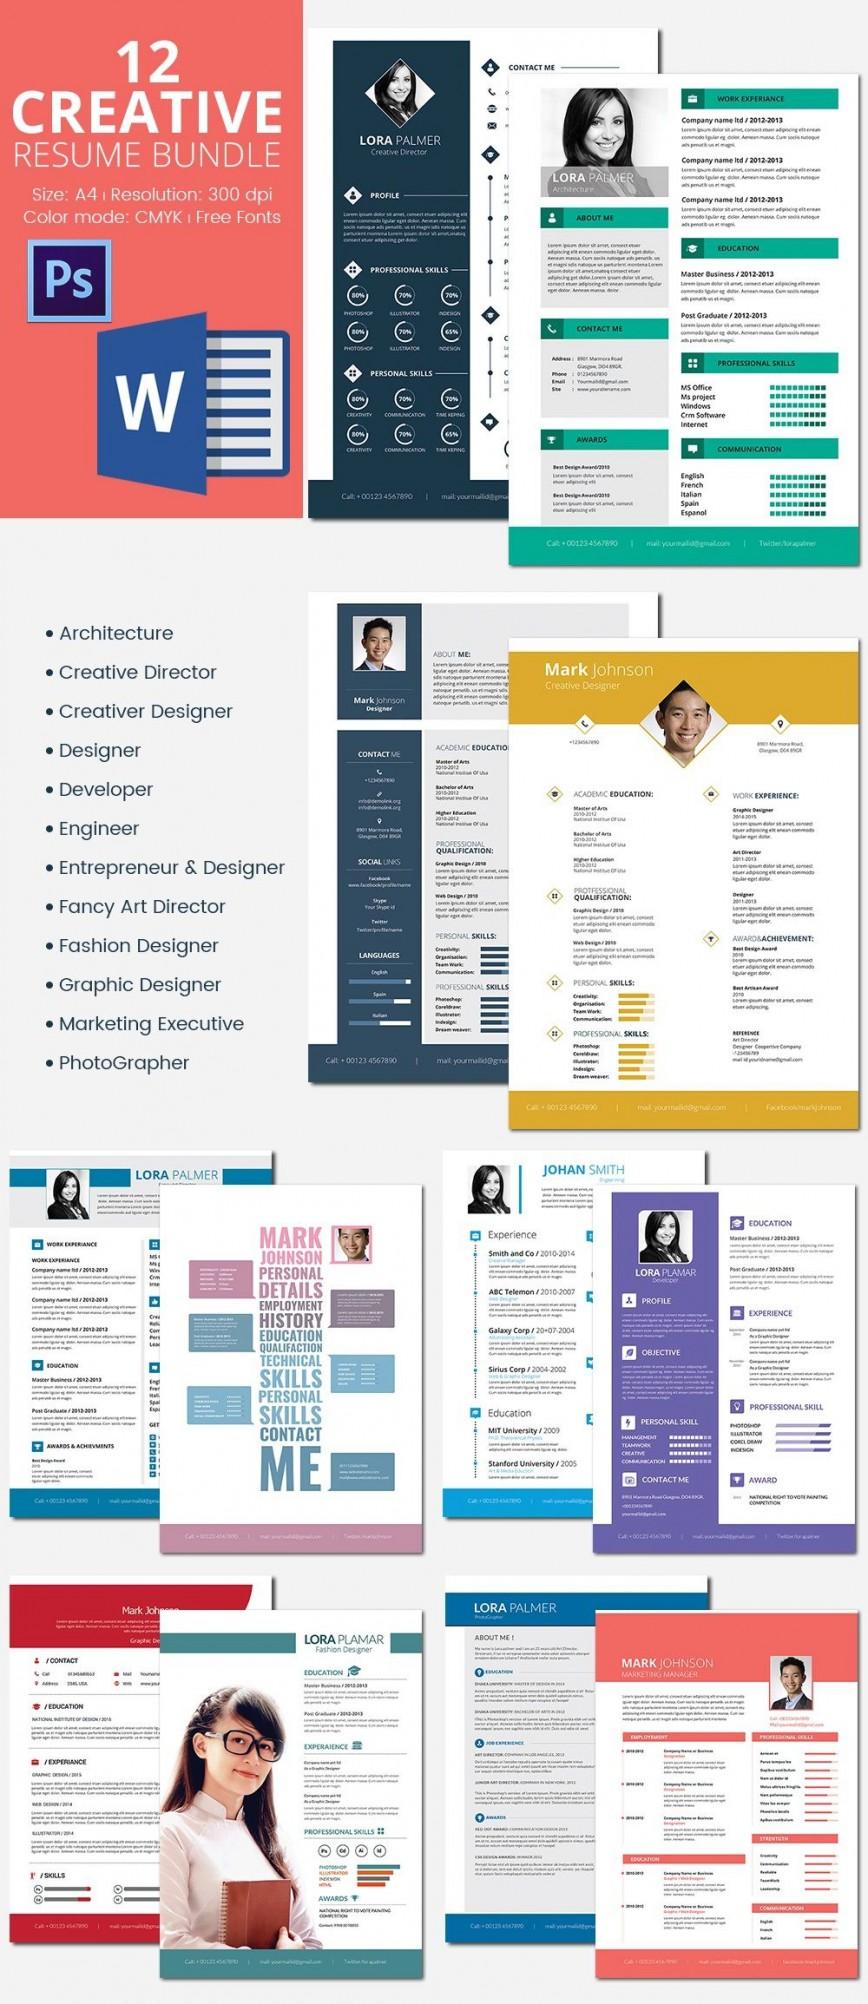 001 Dreaded Software Engineering Resume Template Inspiration  Engineer Microsoft Word Cv Free Developer Download868